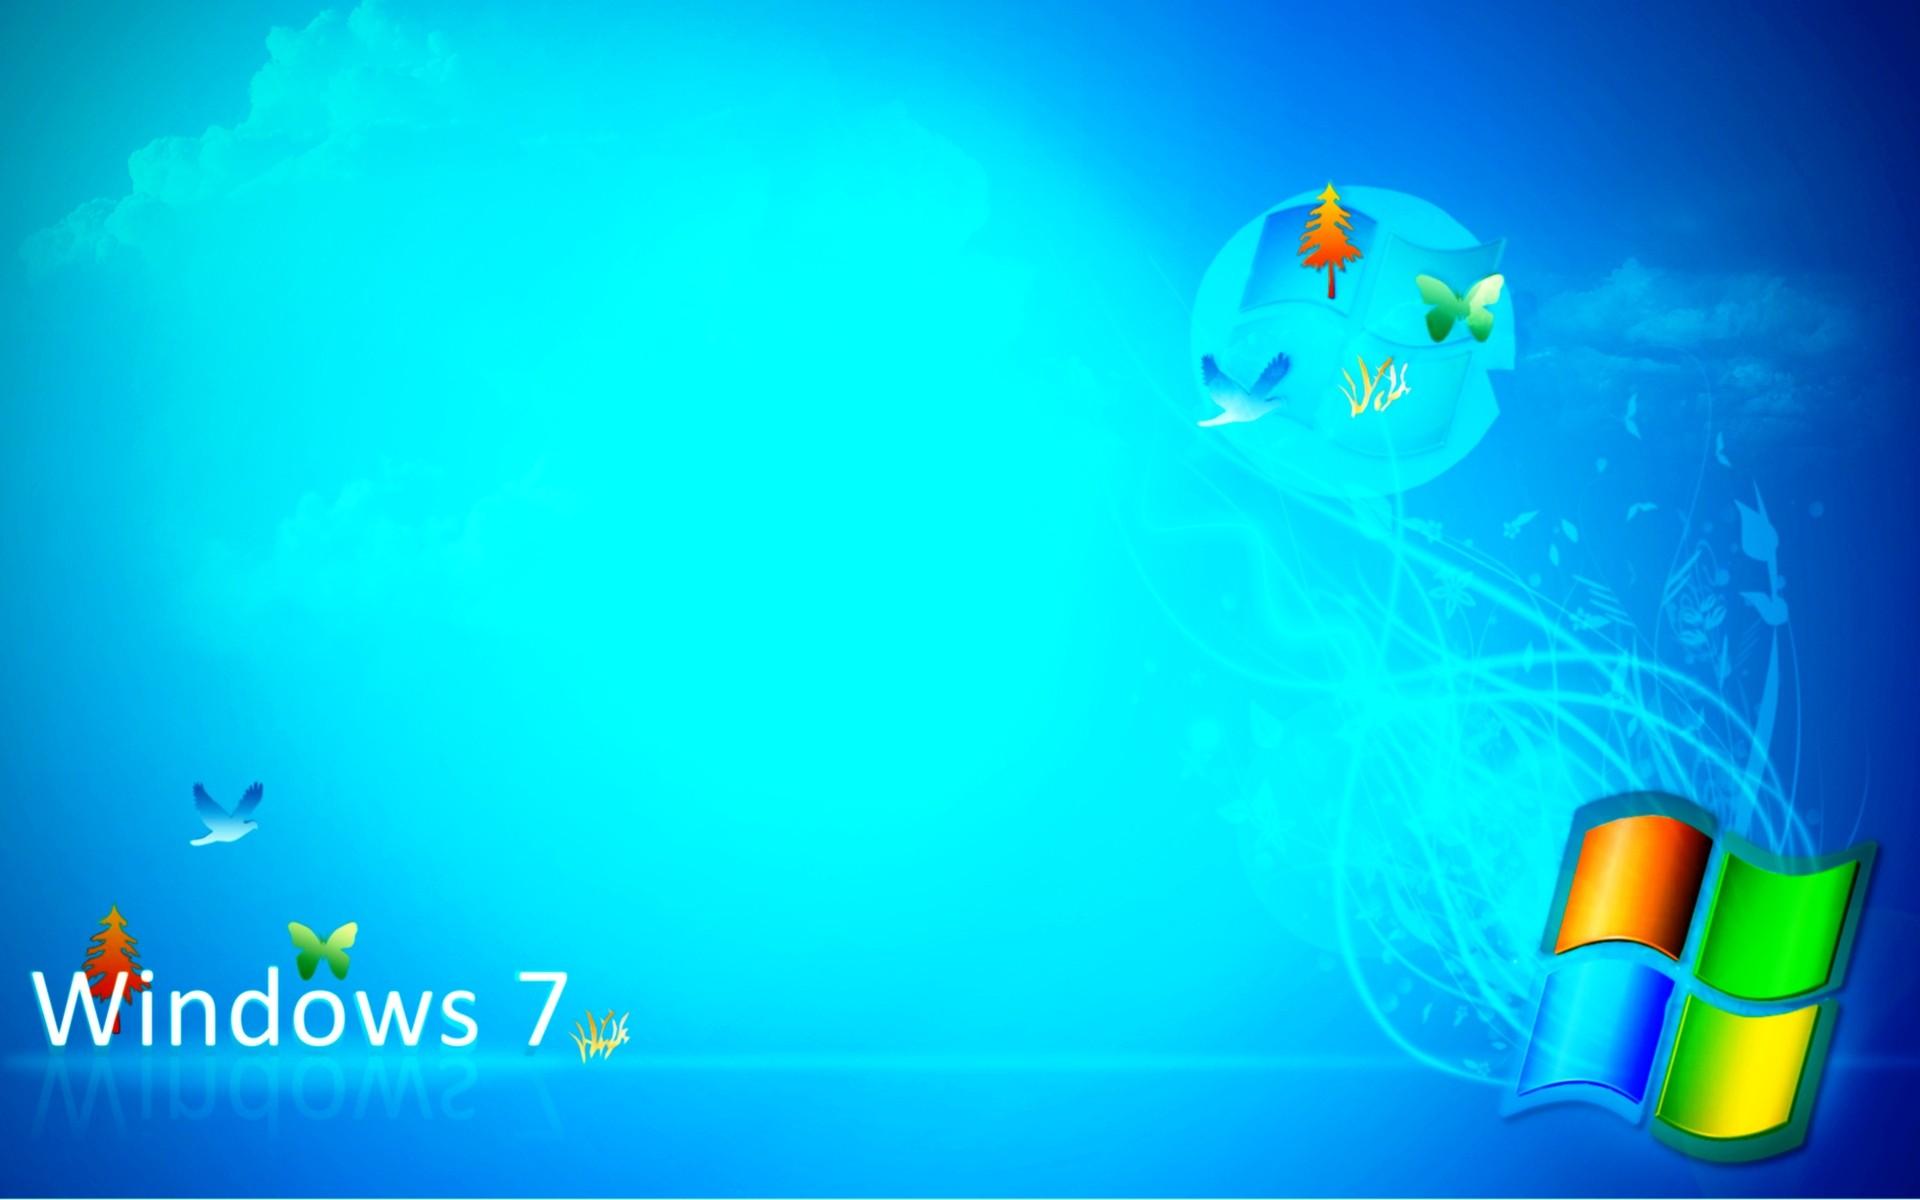 17930 desktop backgrounds windows 7 1920x1200